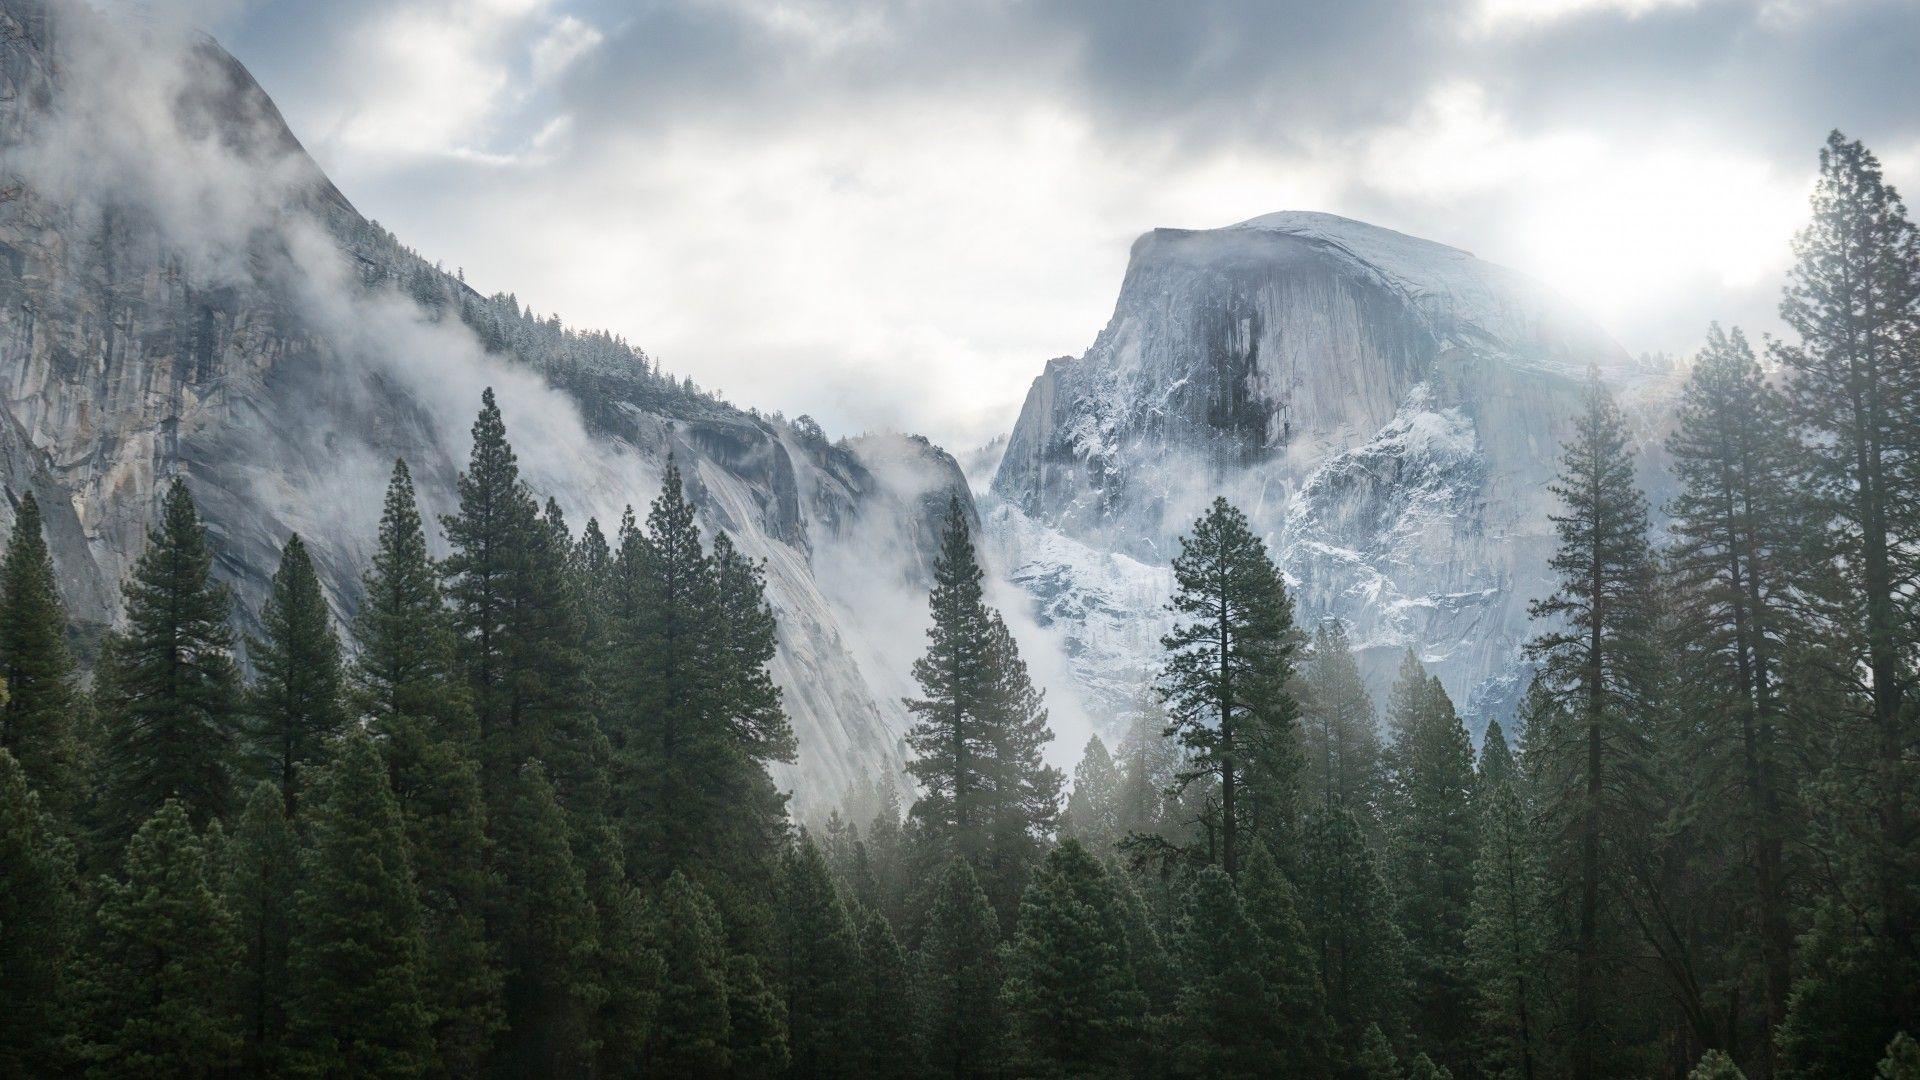 Yosemite computer wallpaper